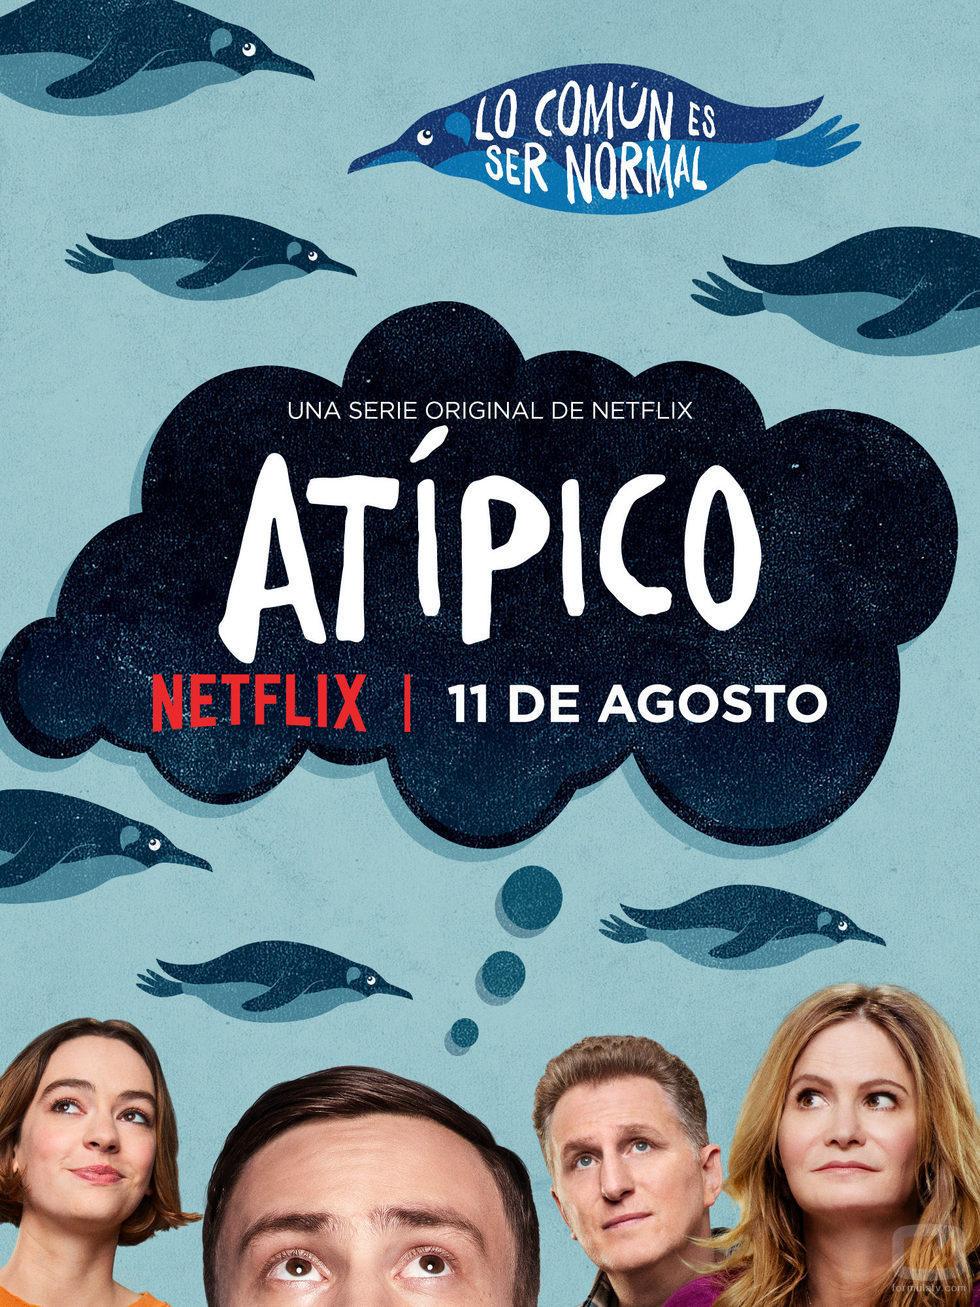 Póster de 'Atípico', la nueva serie de Netflix